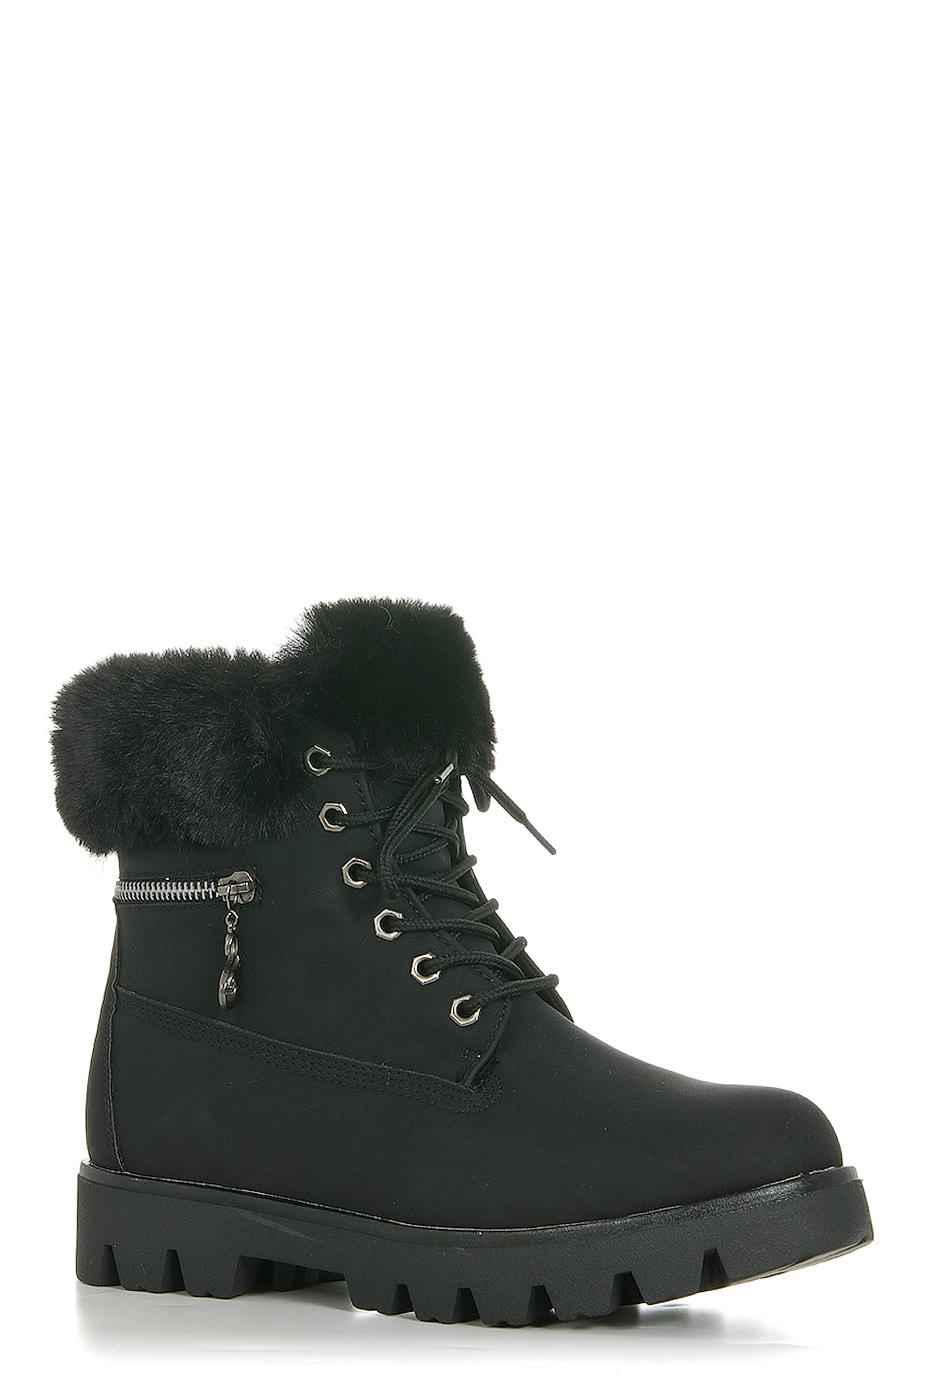 Ботинки TOPLAND2322-PB76254B/BLACK